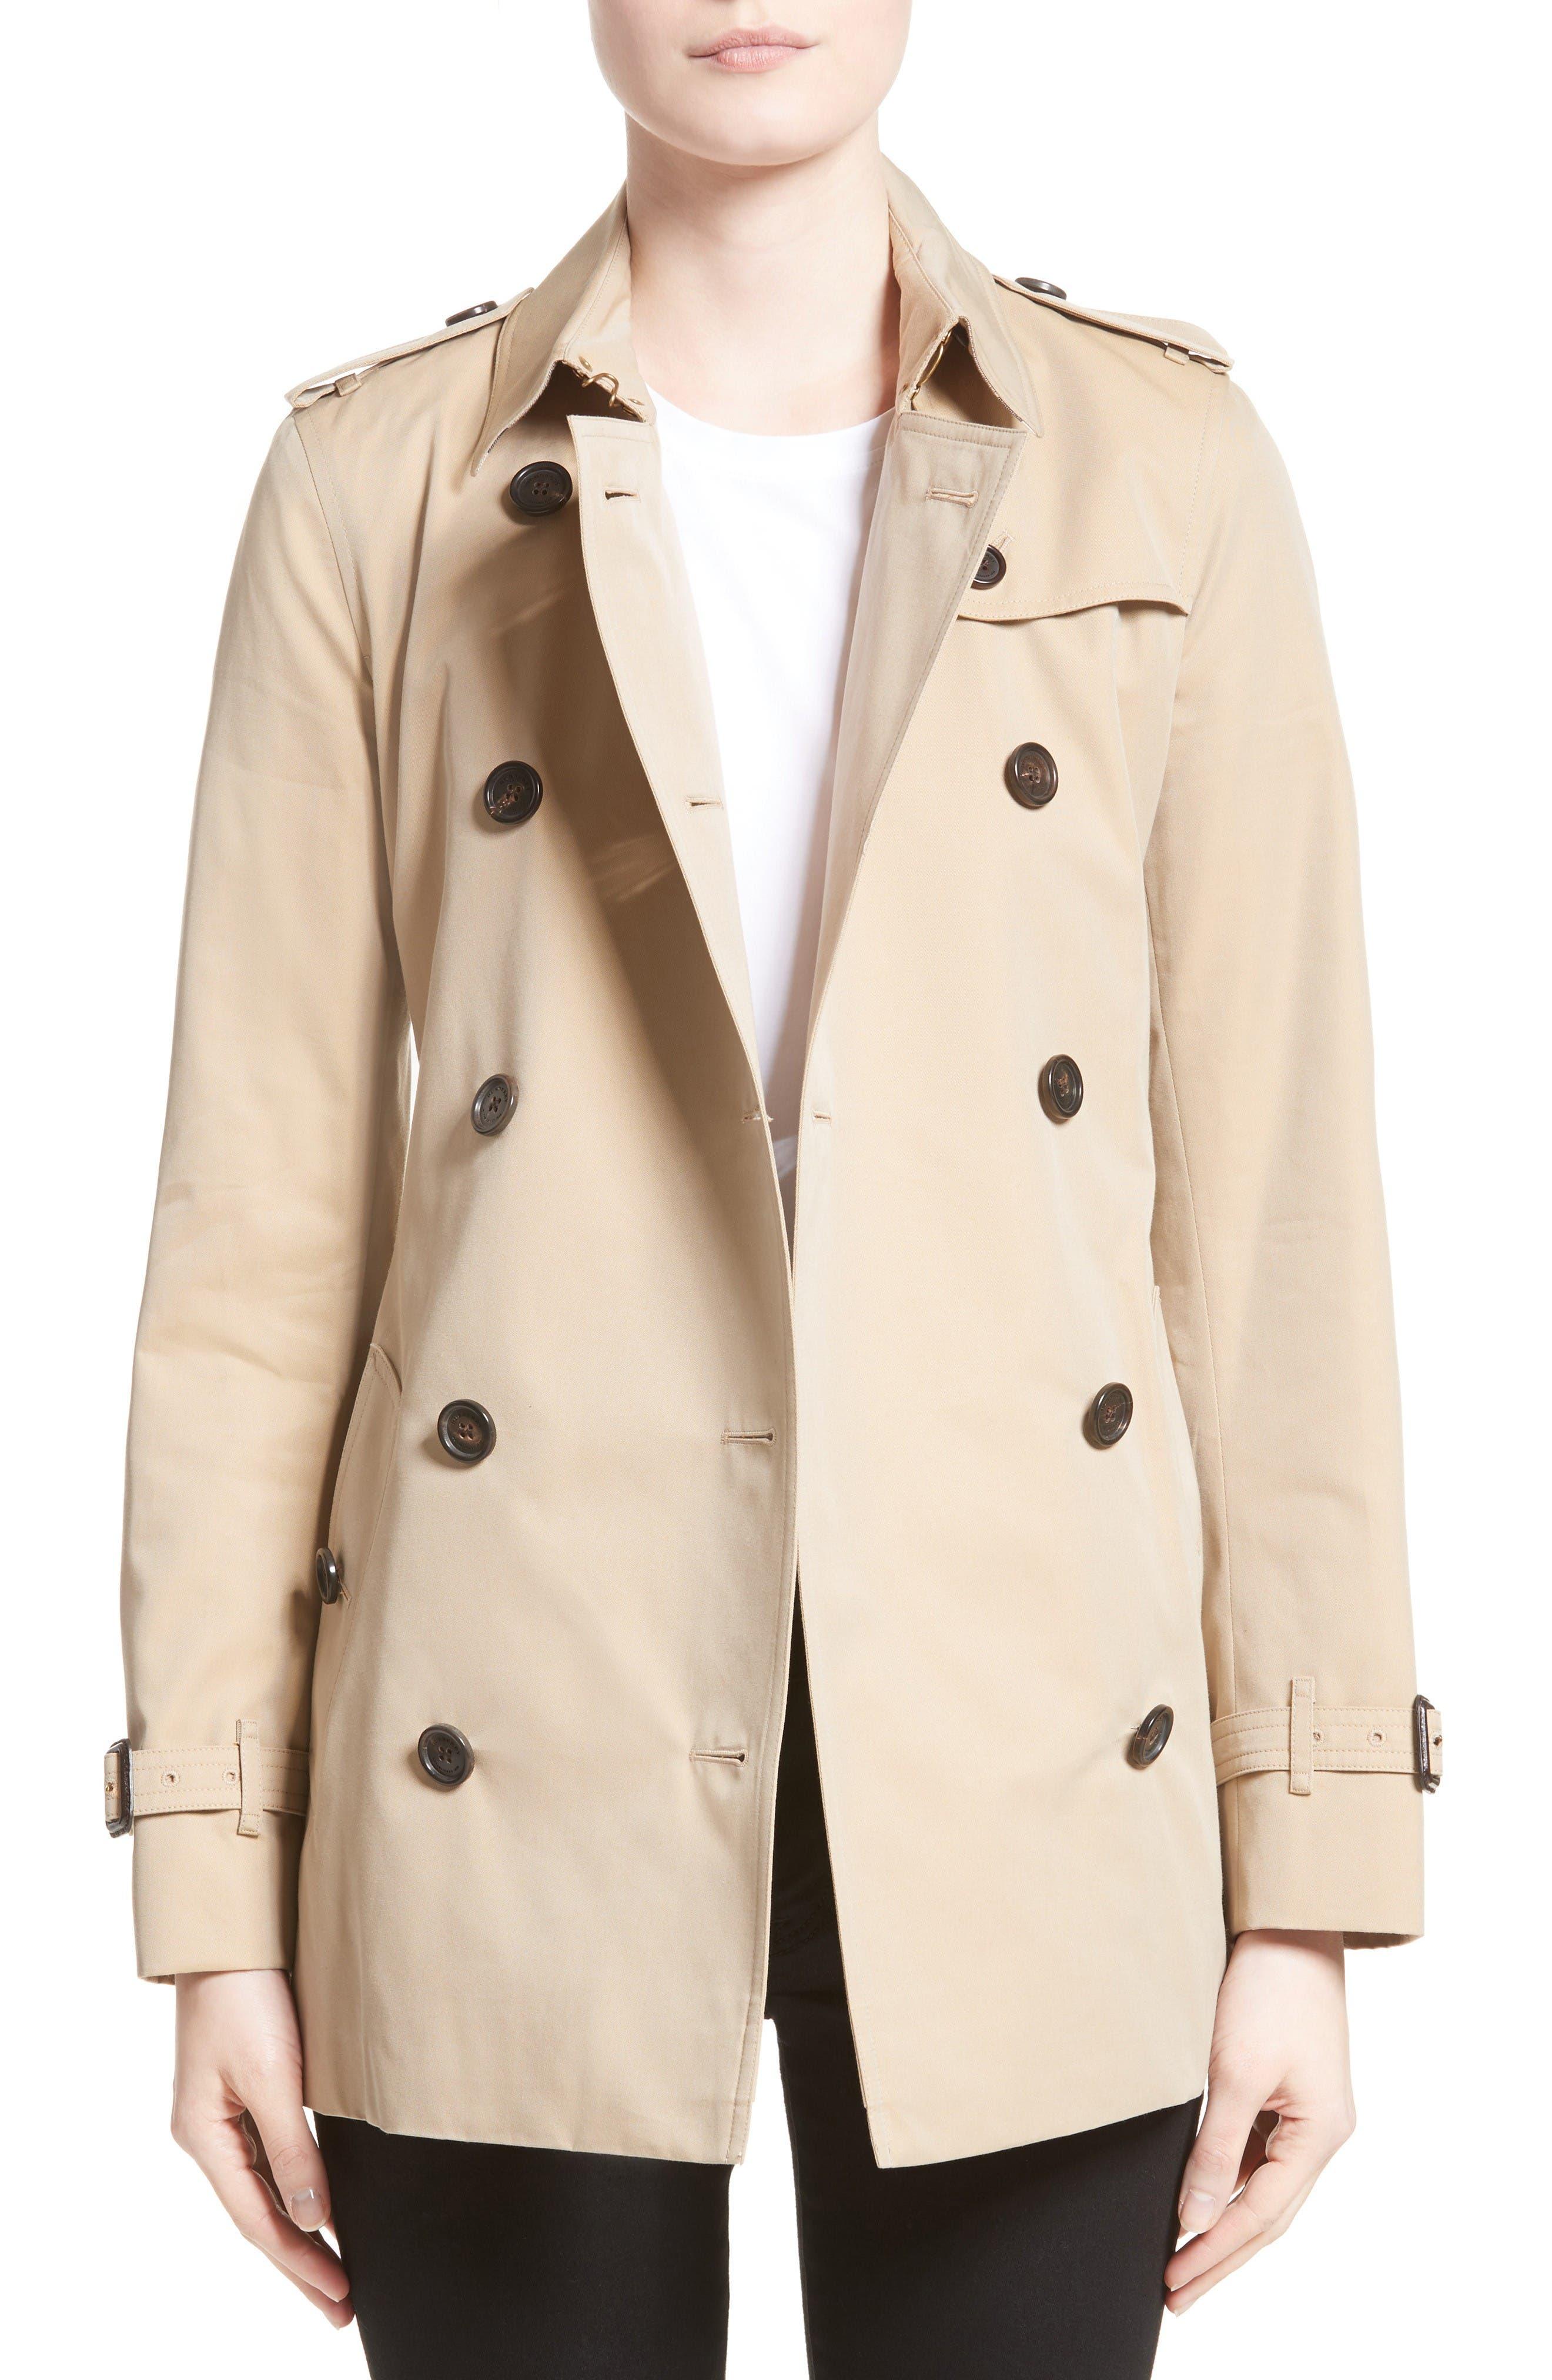 Burberry Kensington Short Trench Coat | Nordstrom